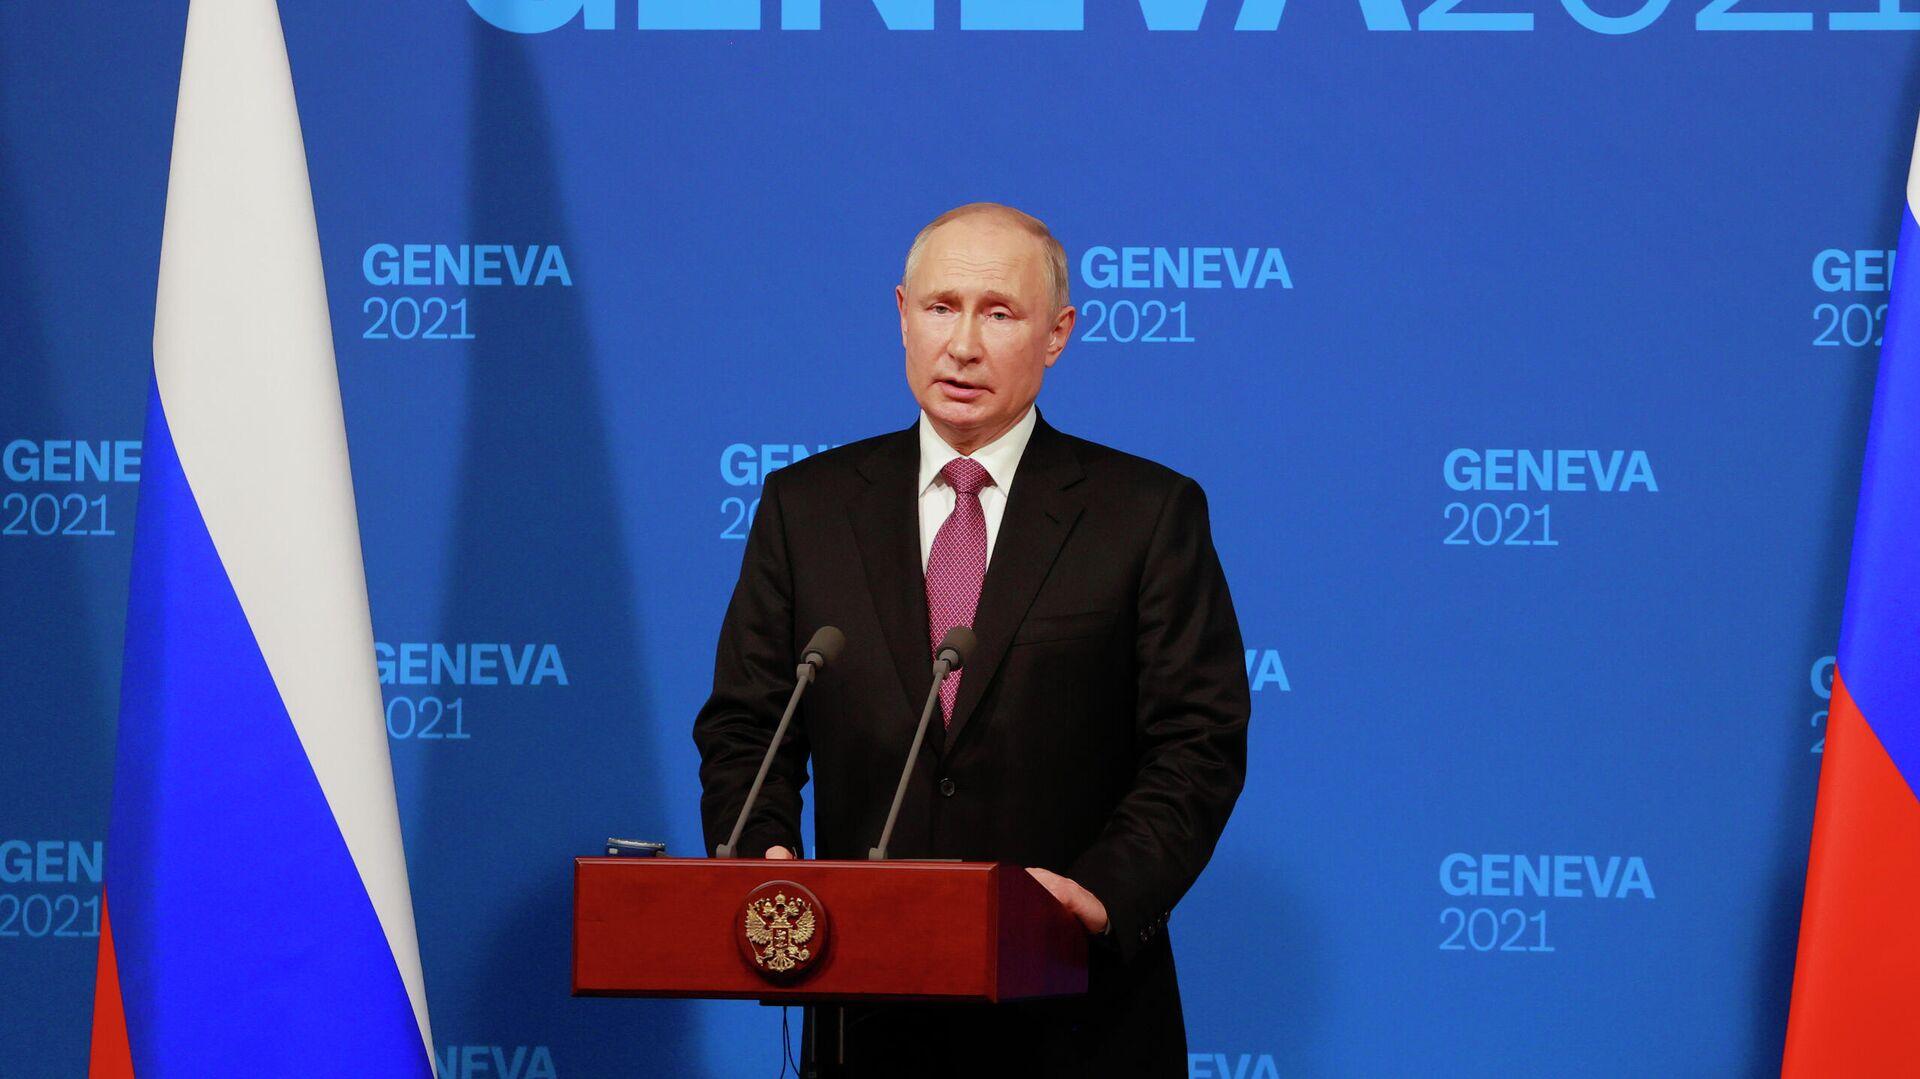 Пресс-конференция Путина на саммите в Женеве - Sputnik Таджикистан, 1920, 16.06.2021